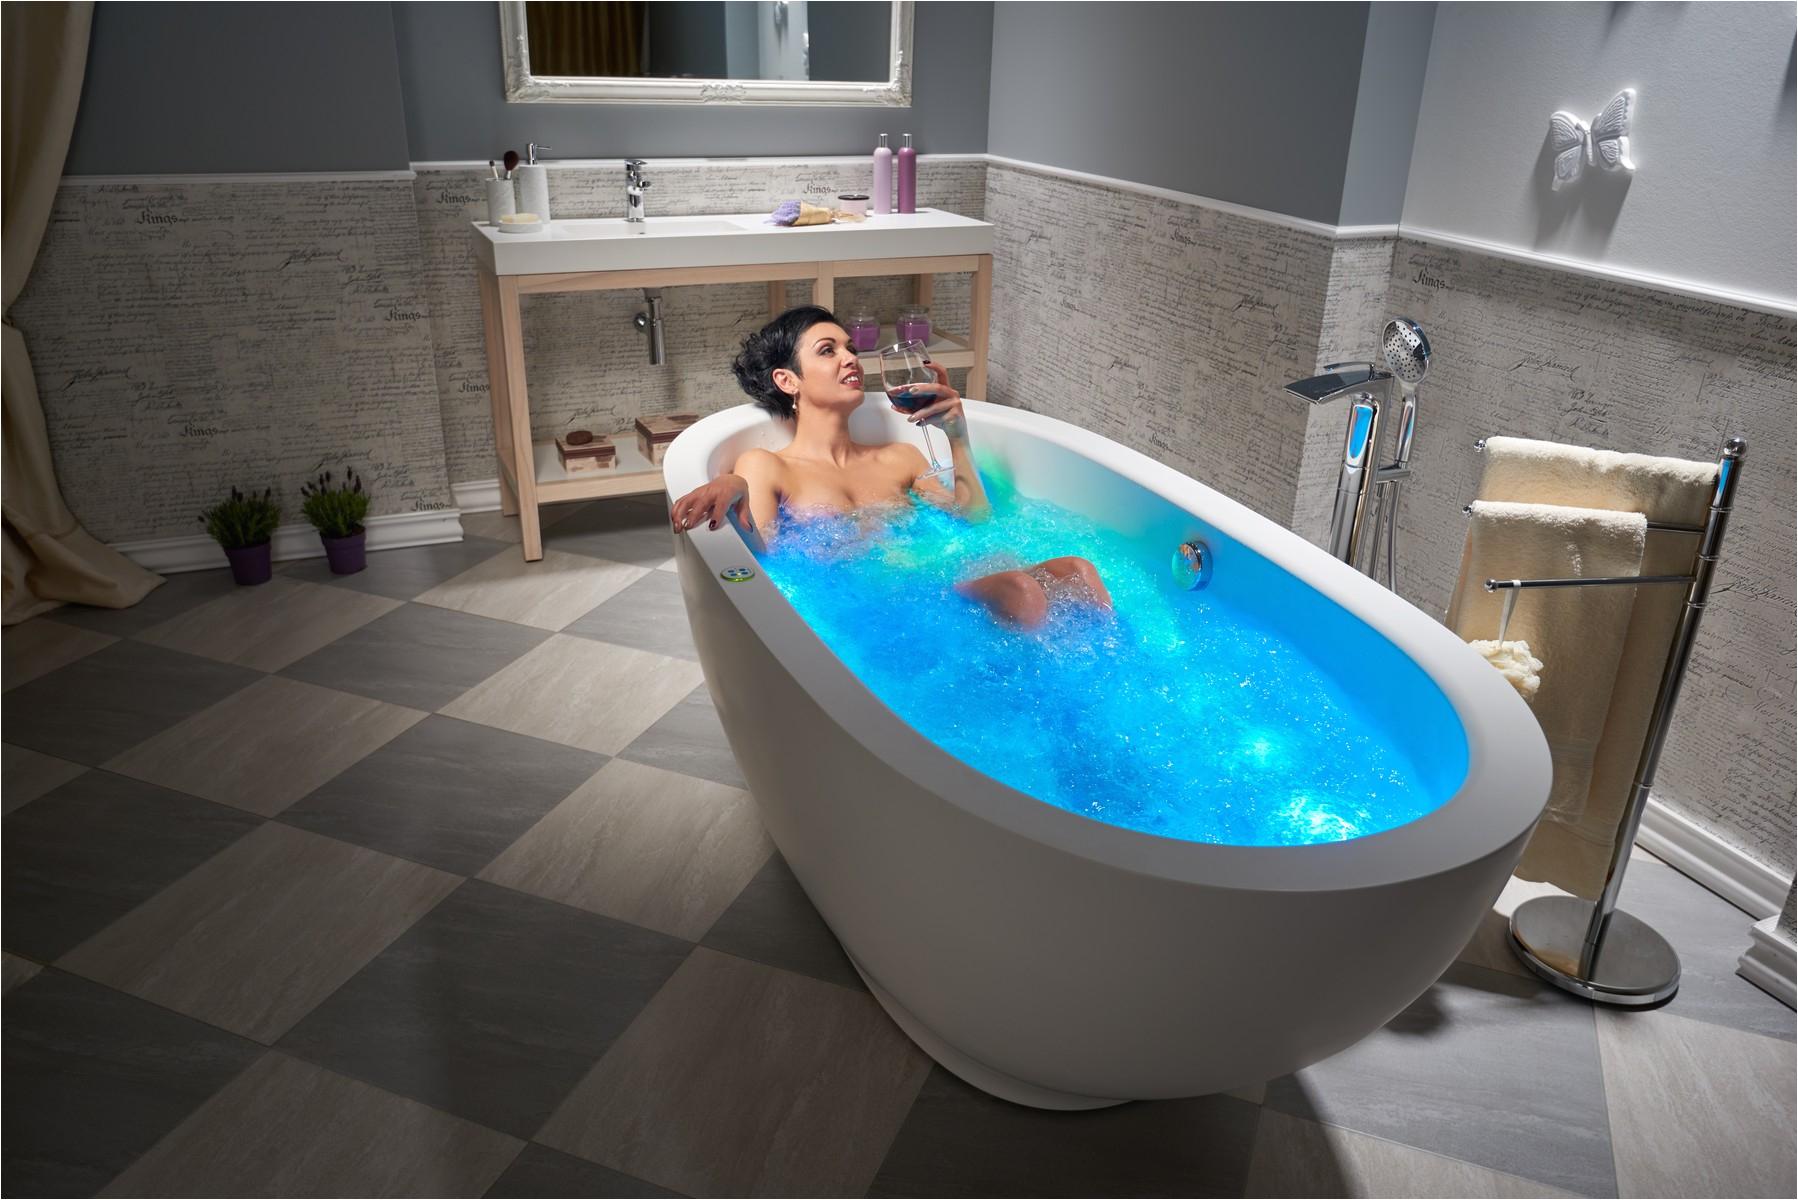 Freestanding Bathtub Air Jets Aquatica Karolina™ Relax solid Surface Air Massage Bathtub